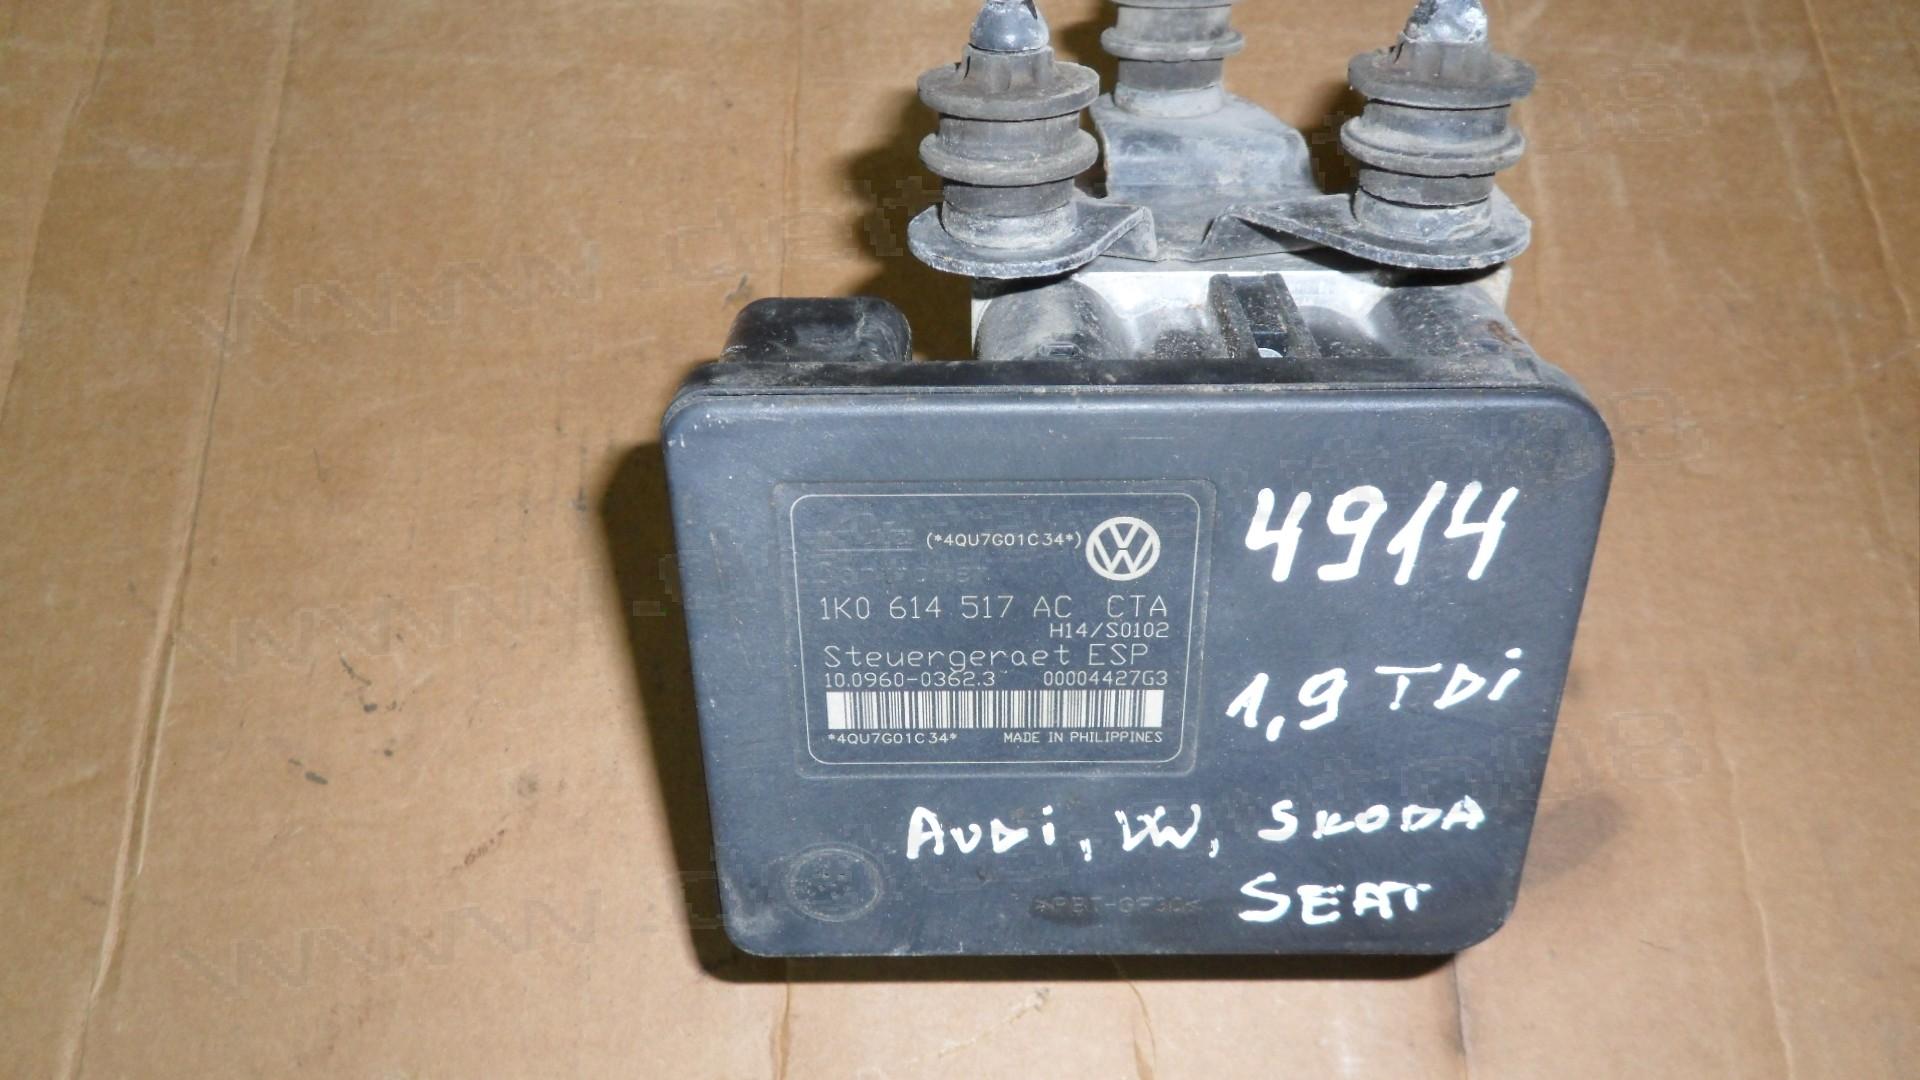 ABS помпа за Audi, Skoda, VW, Seat 1.9 TDi  2005-2010г., 1K0 614 517 AC, 1K0614517AC, 10.0960-0362.3, 10096003623, 00004427G3, 1K0614517ACCTA